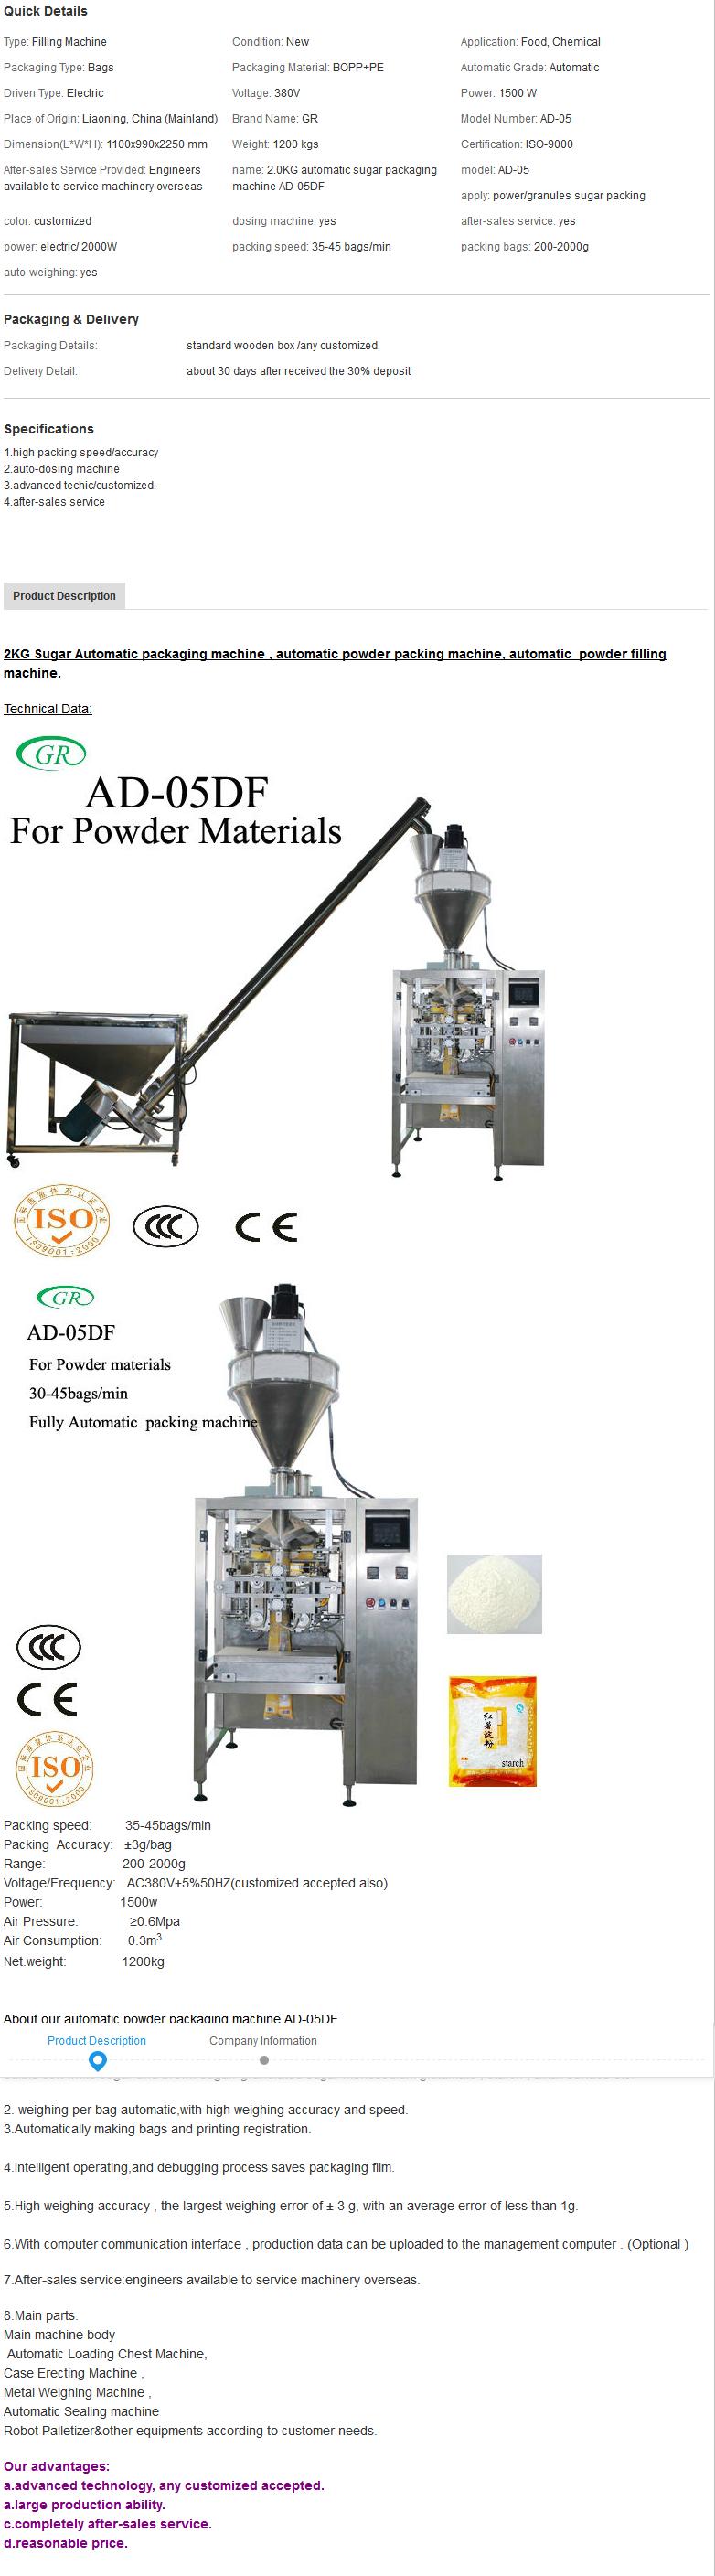 2KG automatic sugar packaging machine AD-05